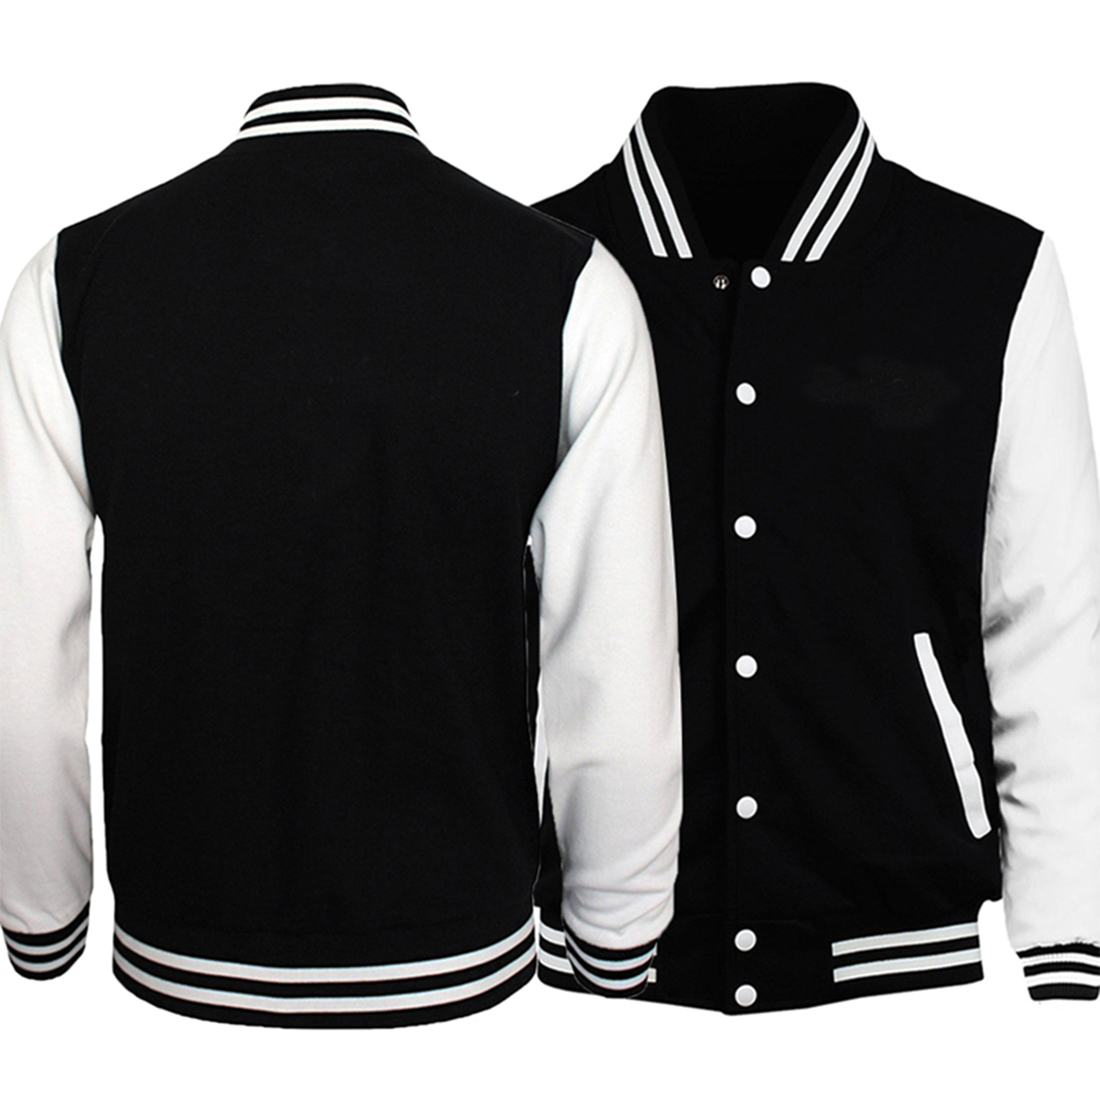 SPQR Hot sale 2019 Men Jacket Baseball Clothing Men 39 s print Jackets Coat For Men Hoodies Tracksuits Bomber Jacket school uniform in Jackets from Men 39 s Clothing